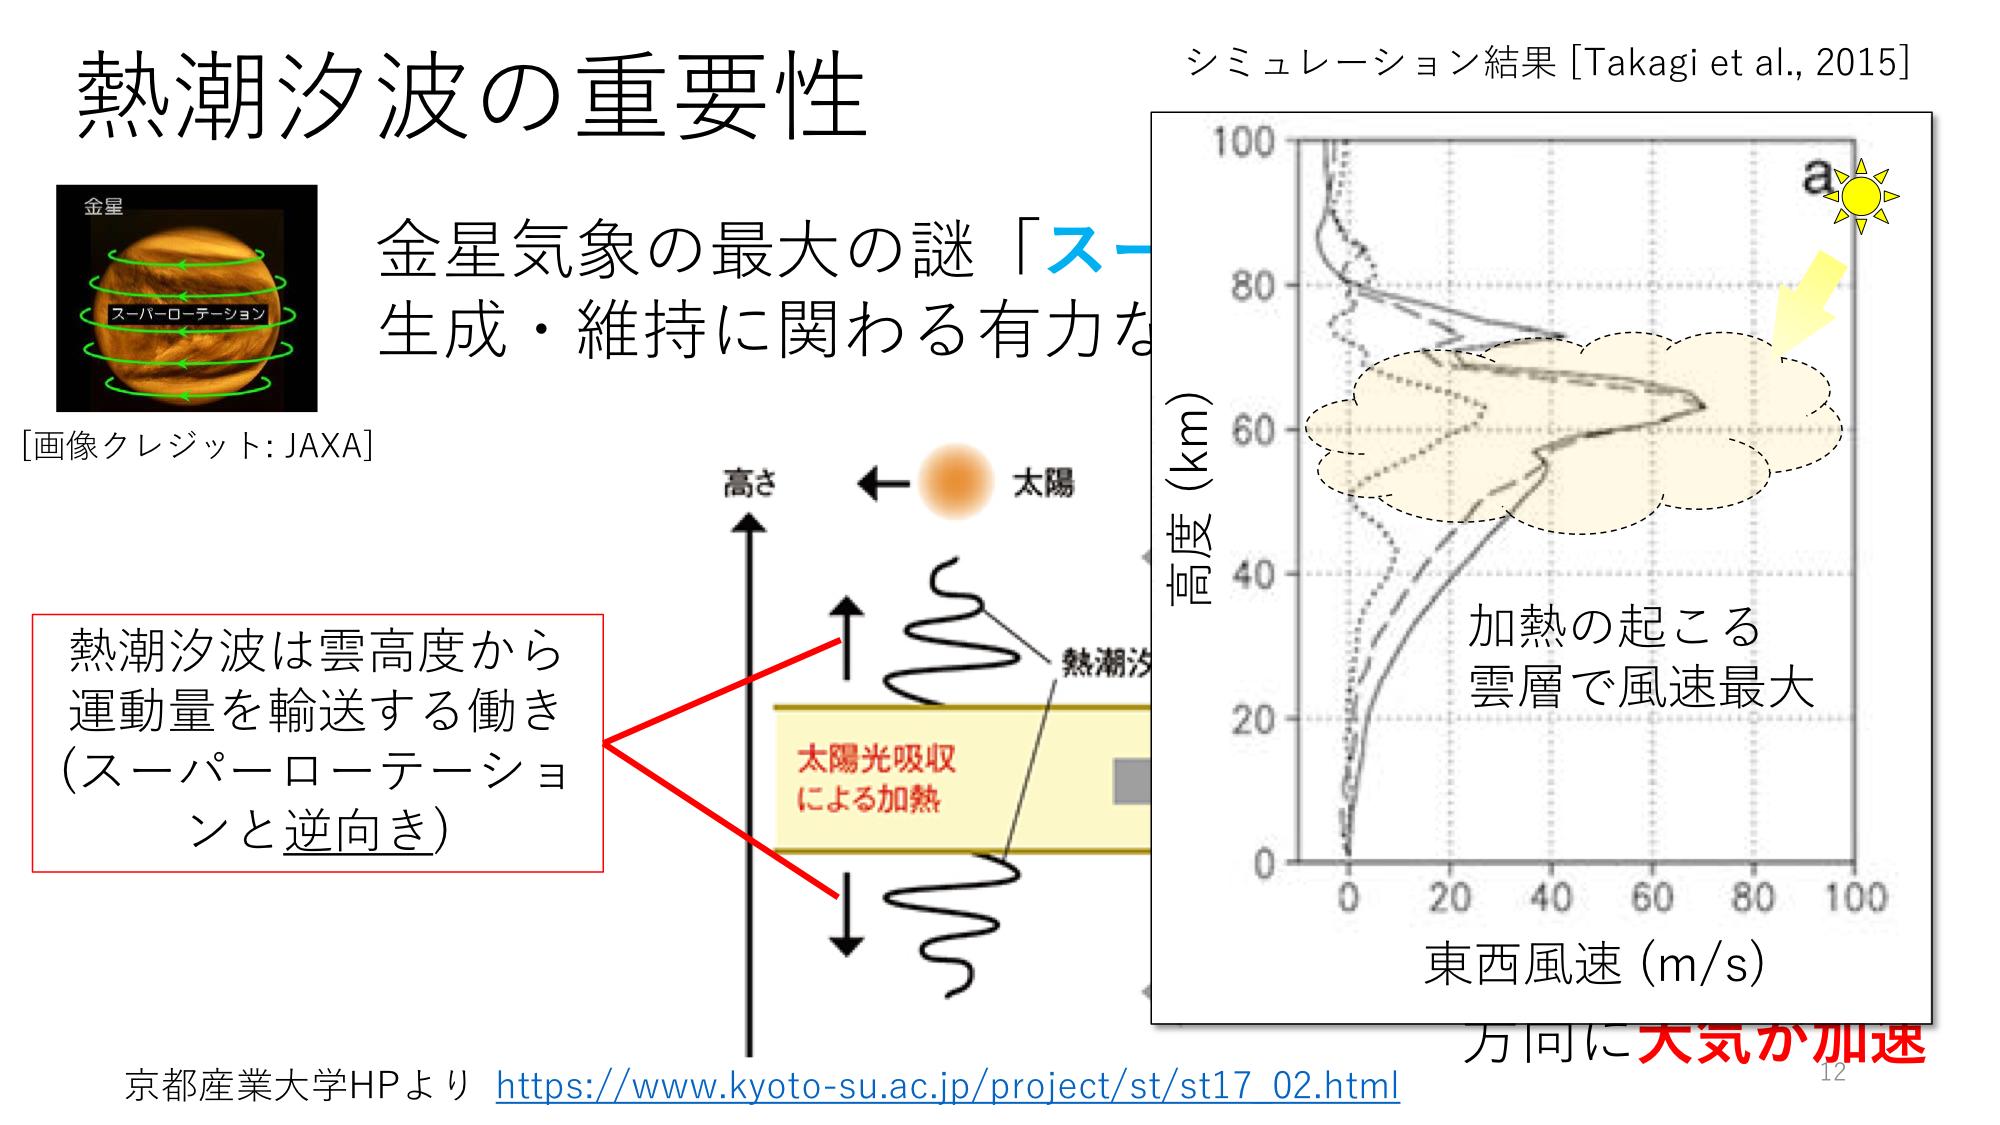 f:id:Imamura:20191119205444p:plain